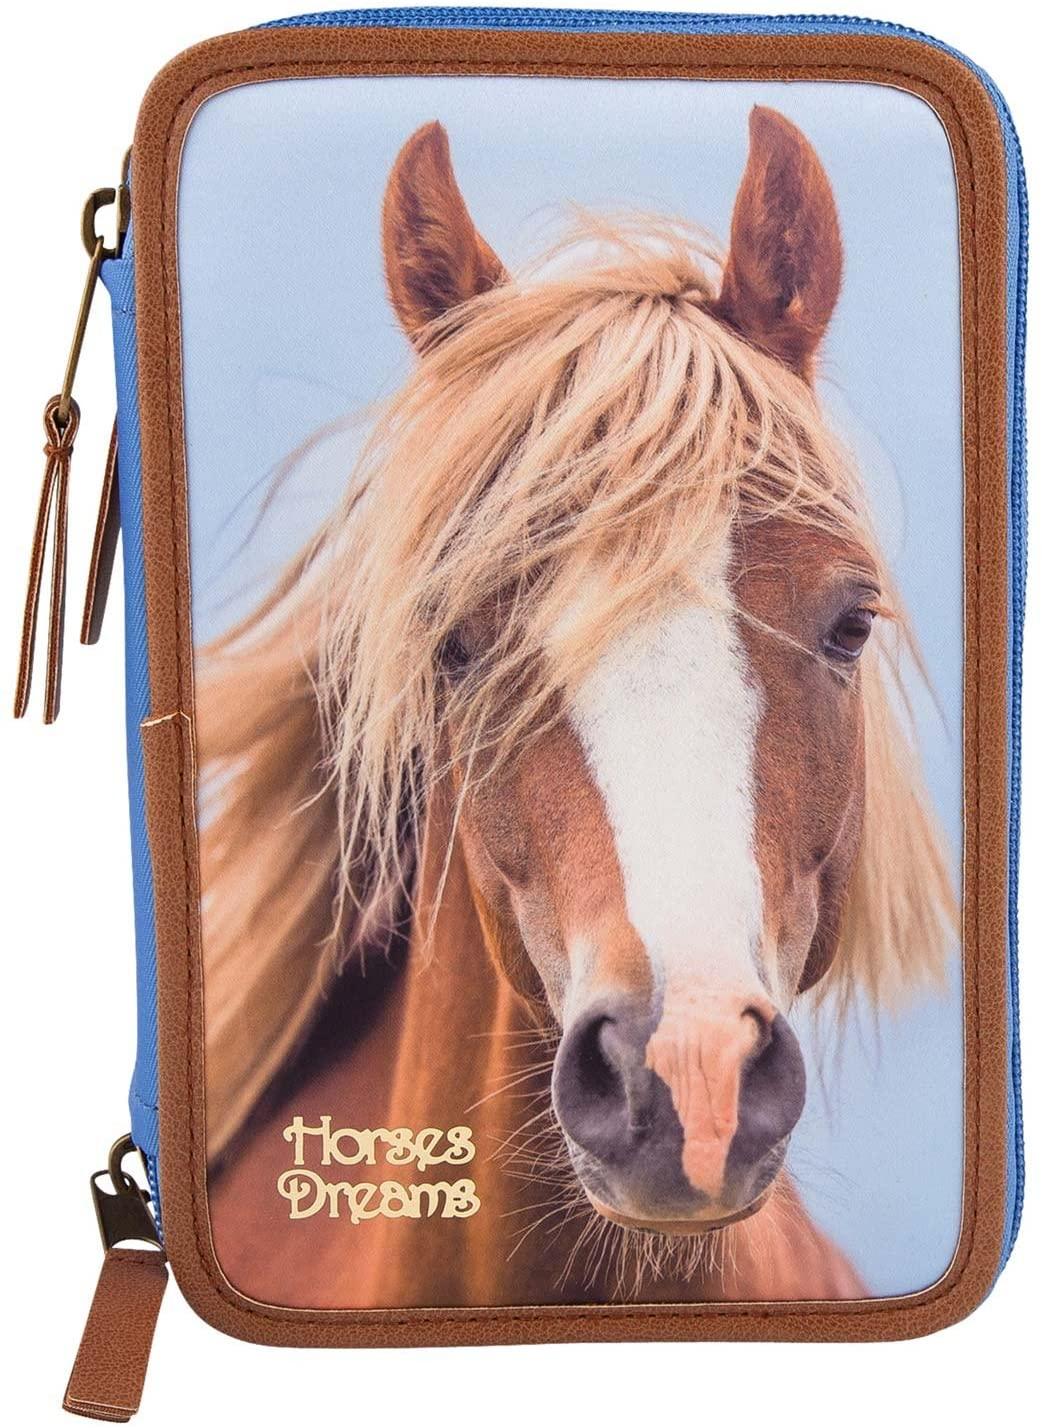 Horses Dreams 3-fach Federtasche